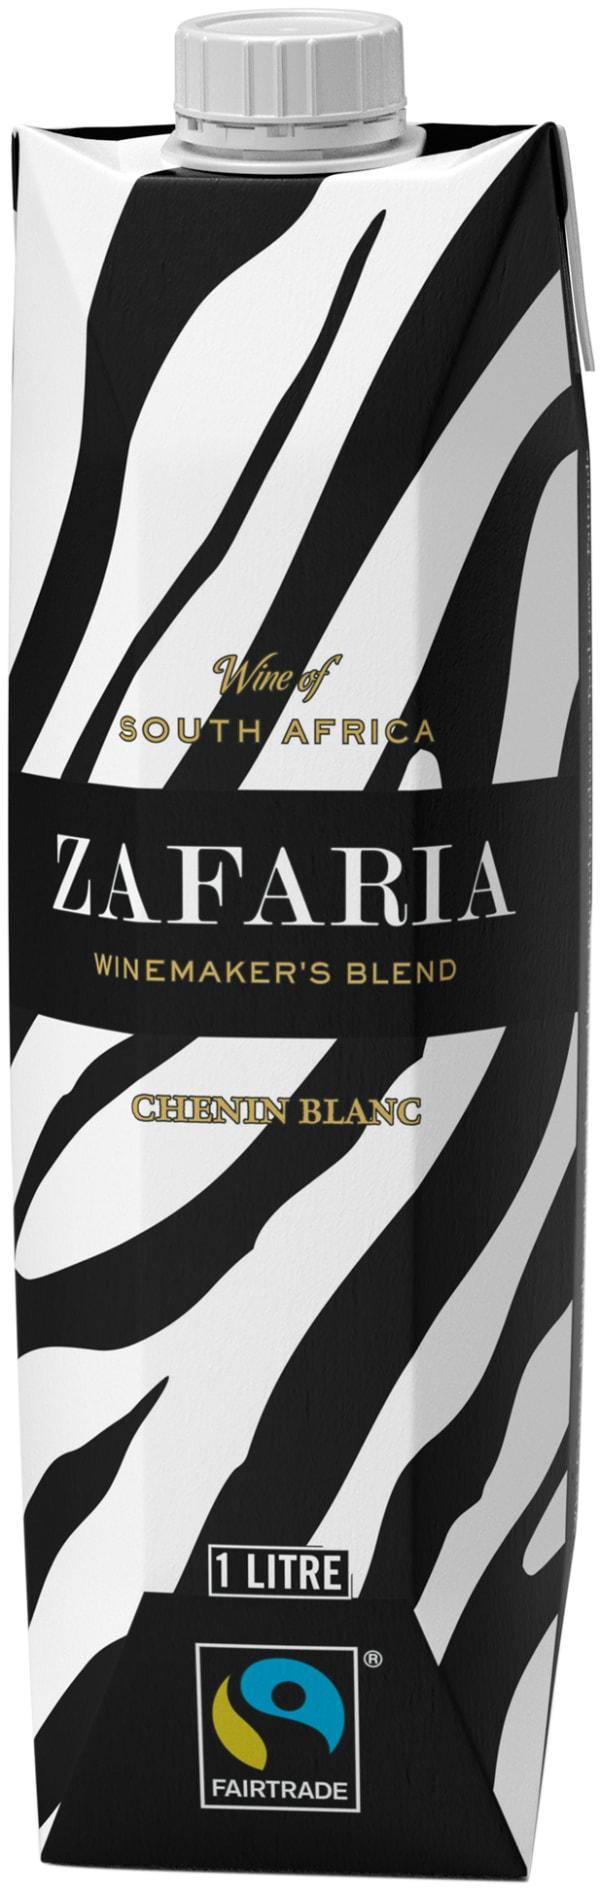 Zafaria Winemakers Blend Chenin Blanc 2018 carton package